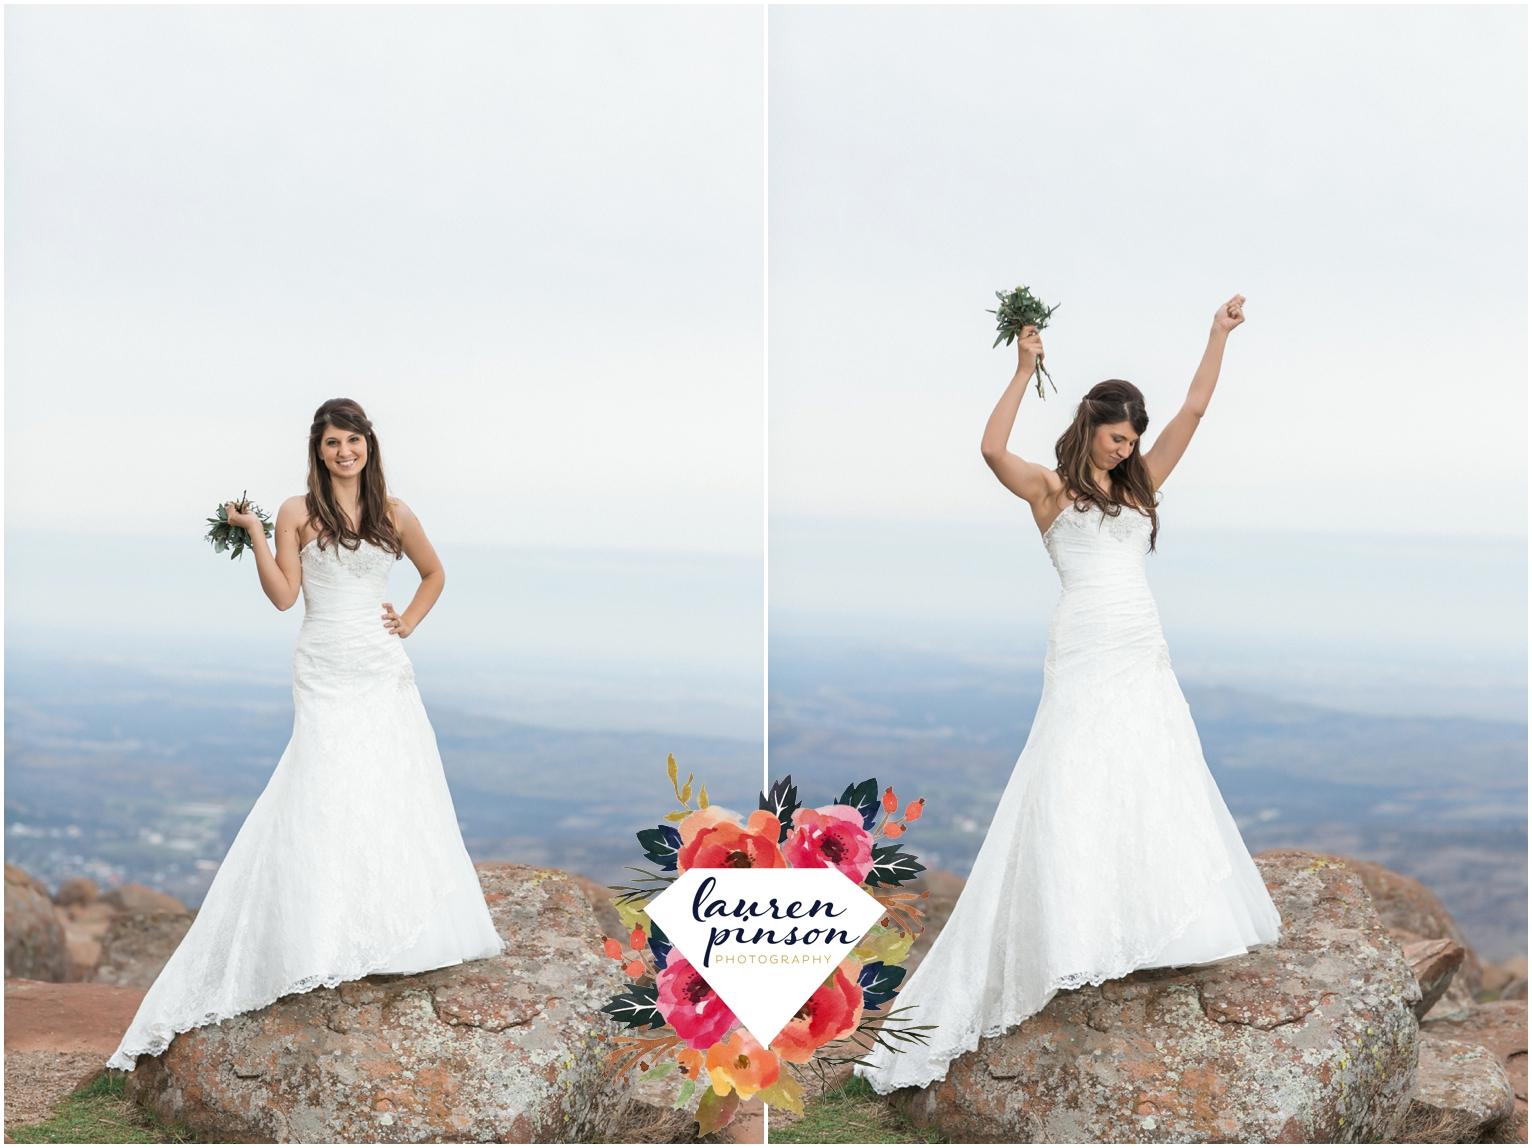 wichita-falls-wedding-photographer-oklahoma-wichita-mountains-bridal-session-bridals-photography_0677.jpg